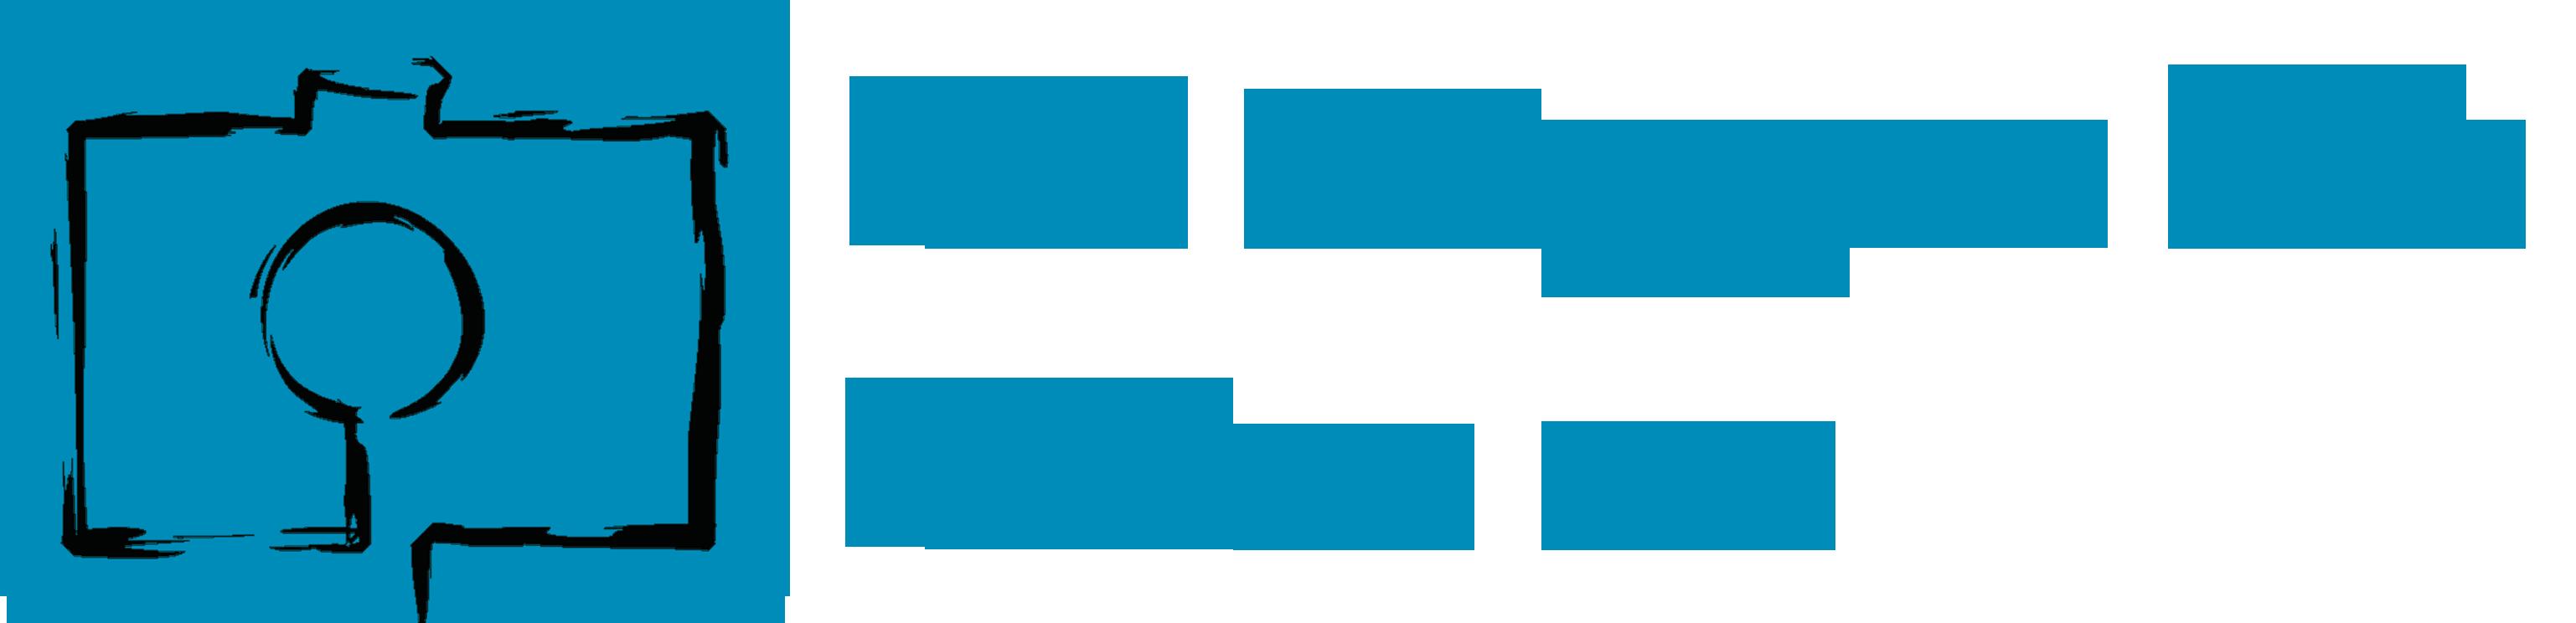 Fotografie Mauer